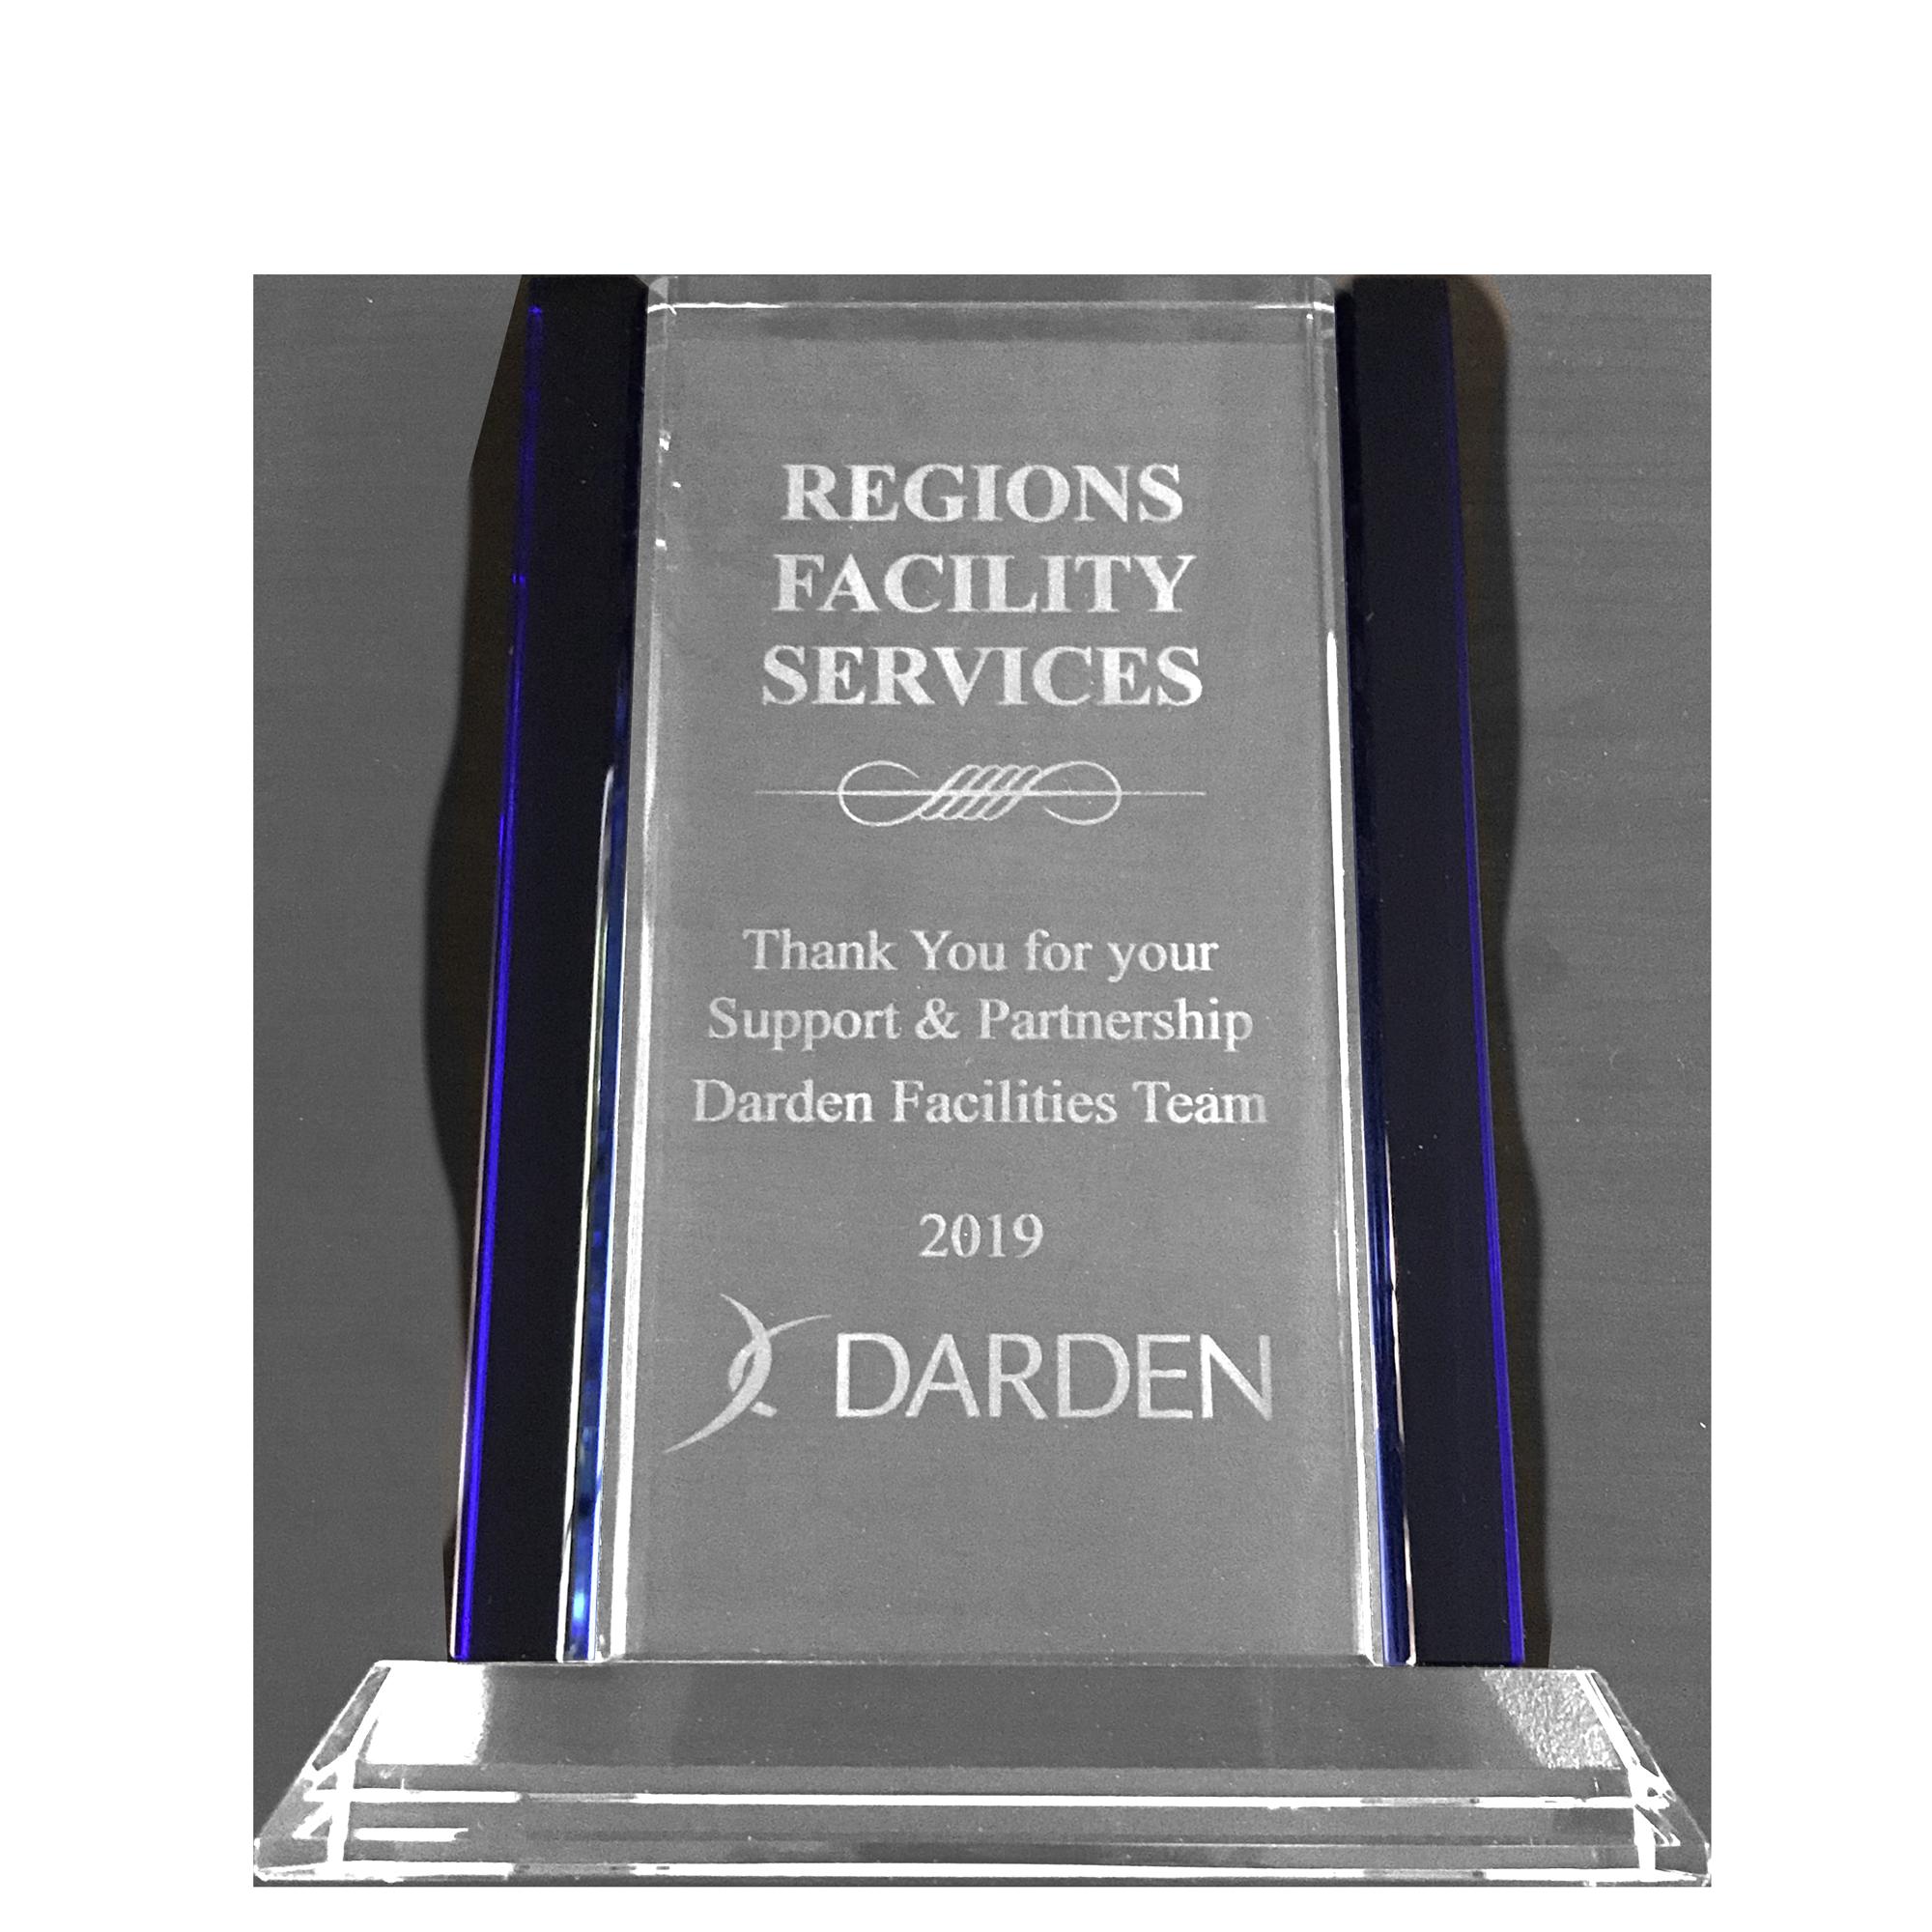 Darden-Vendor-Appreciation-Award-2019.png